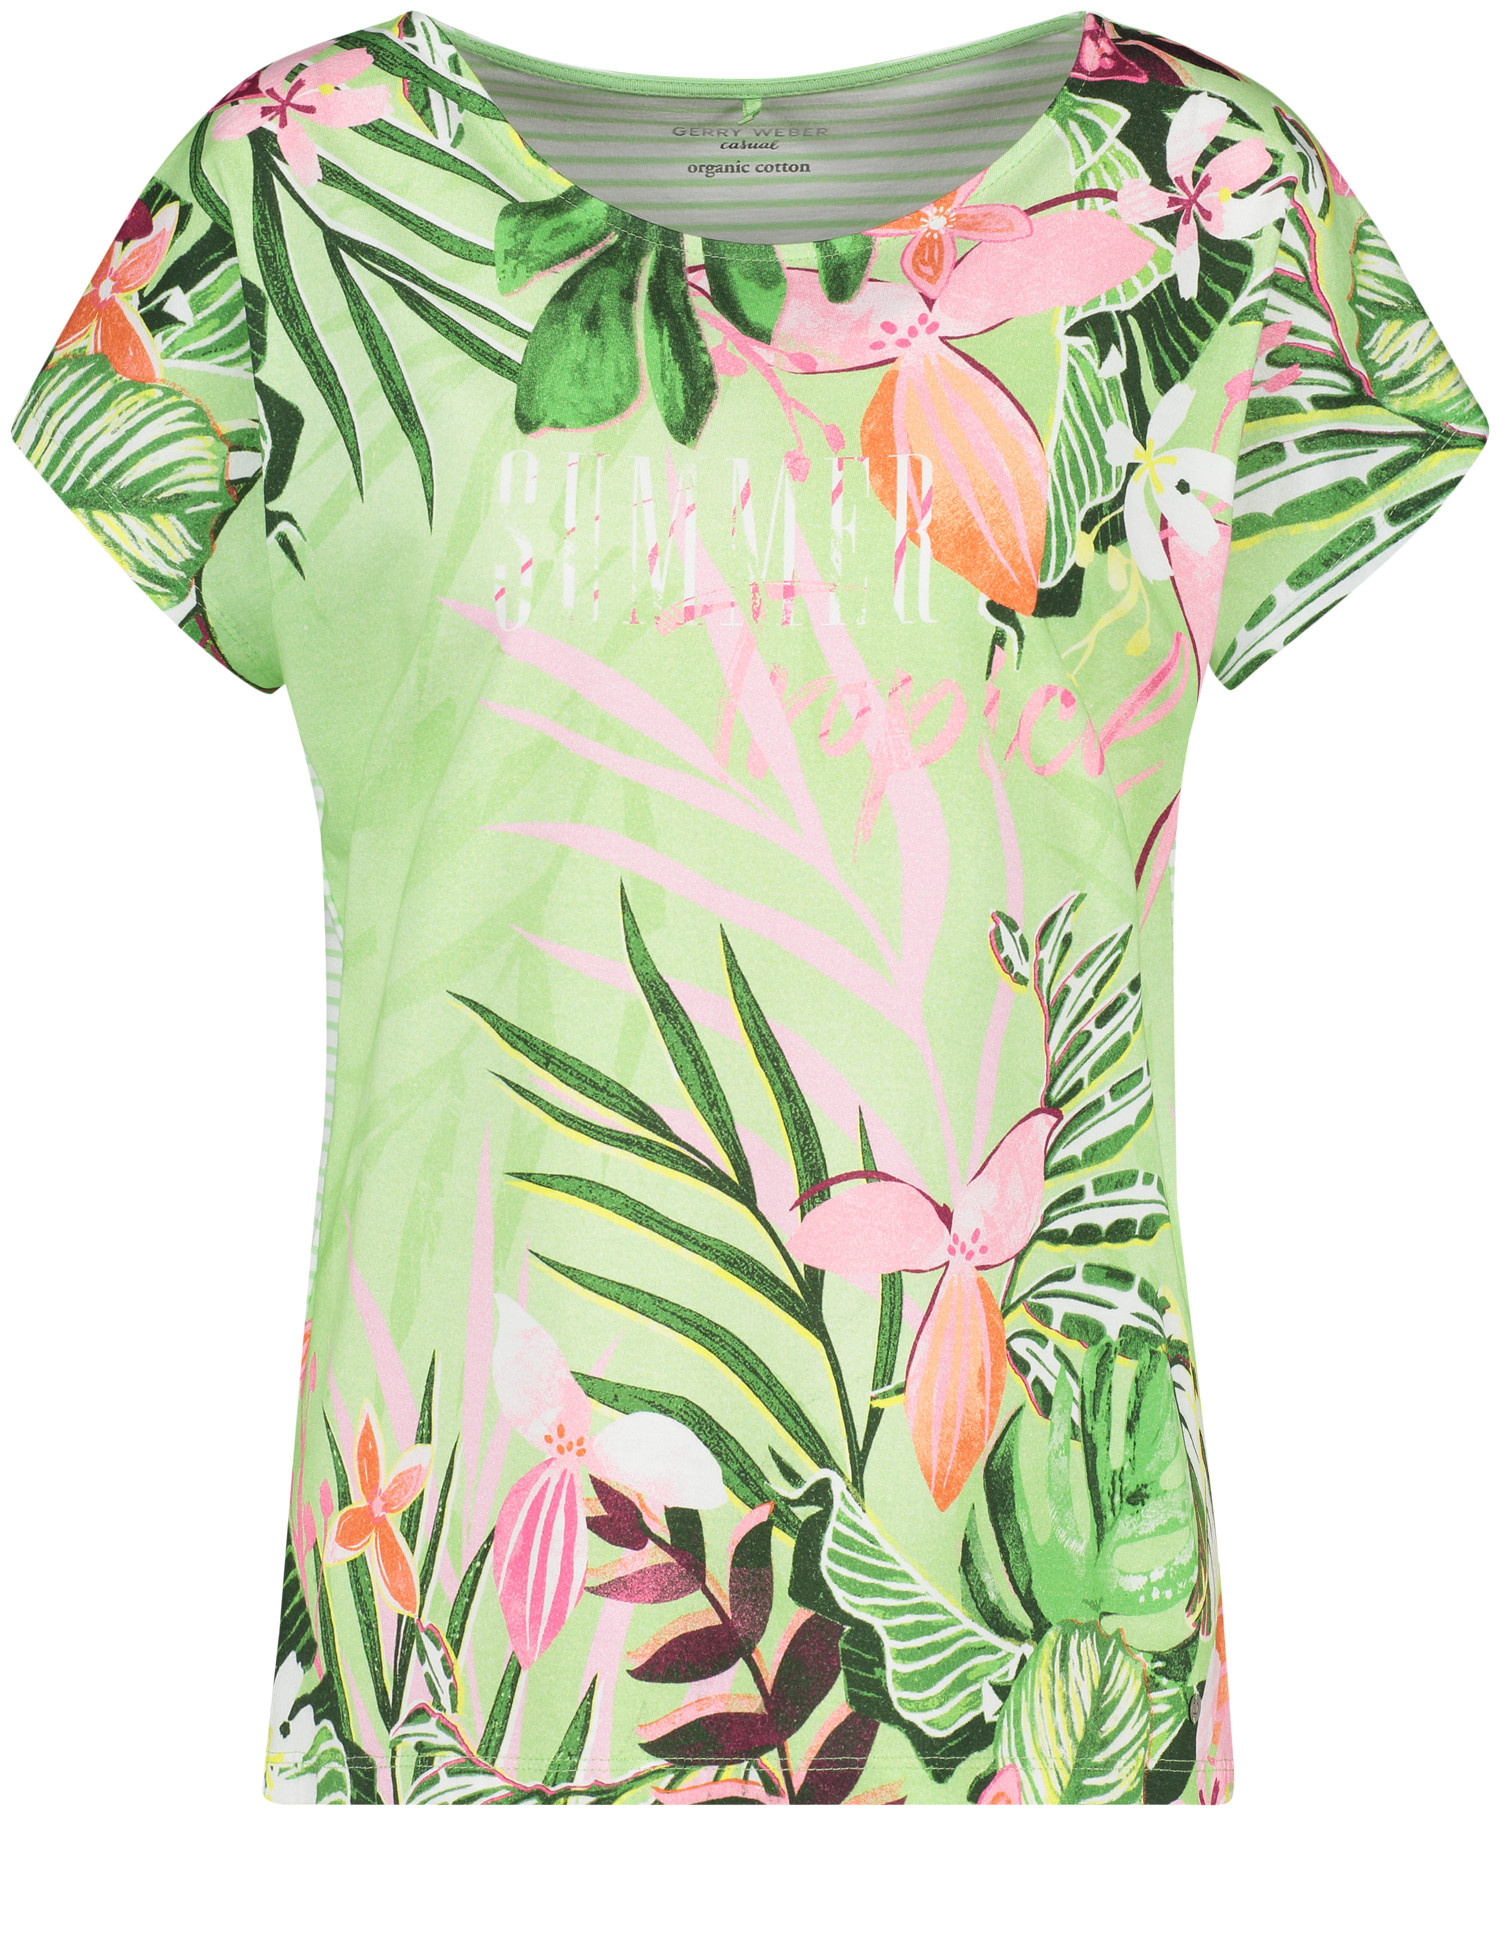 Gerry Weber Floral t-shirt, green multicolor, 44